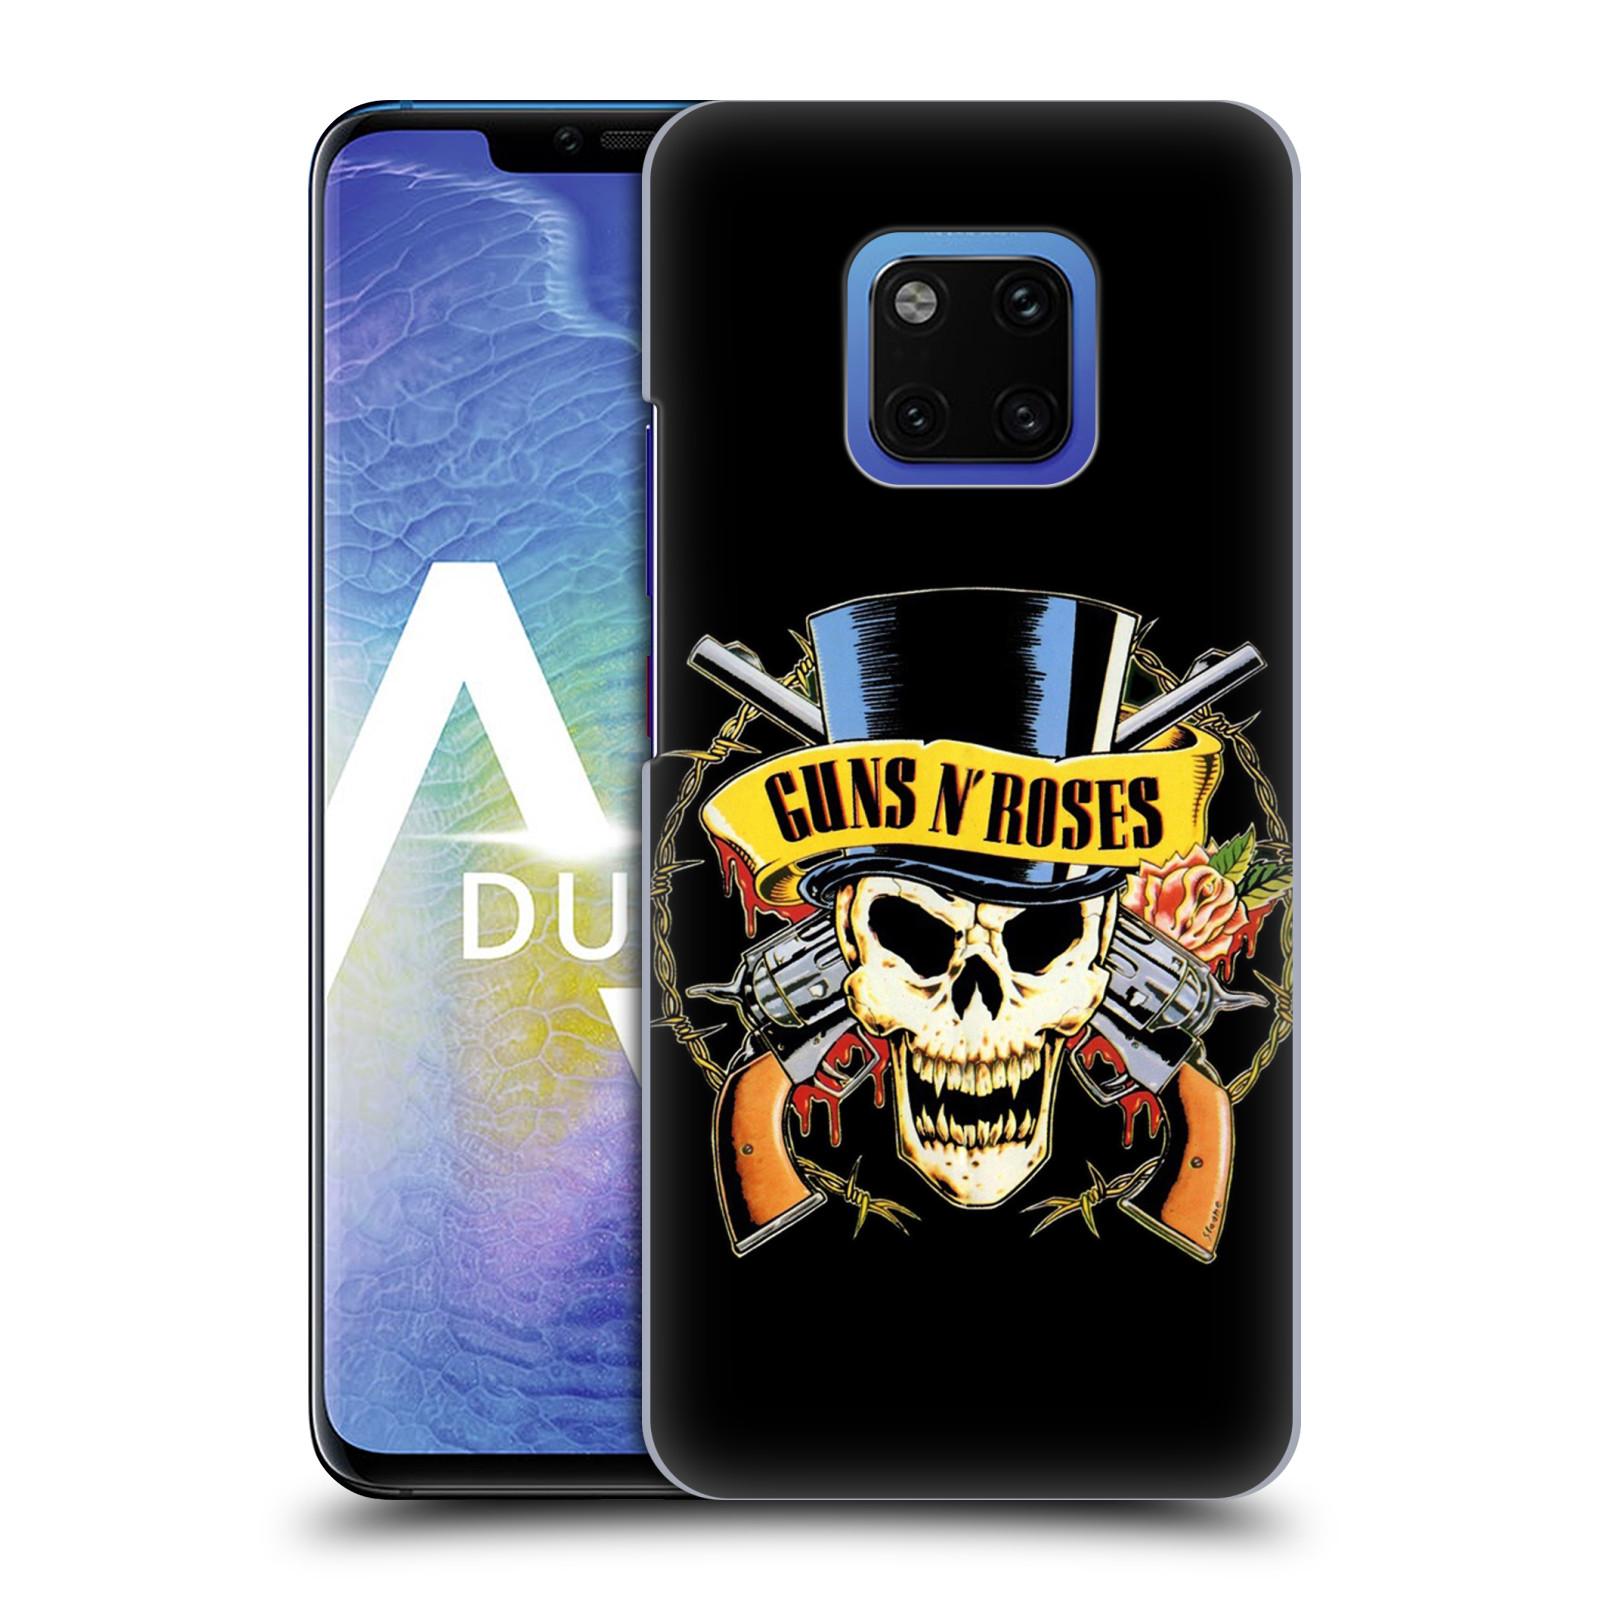 Plastové pouzdro na mobil Huawei Mate 20 Pro - Head Case - Guns N' Roses - Lebka